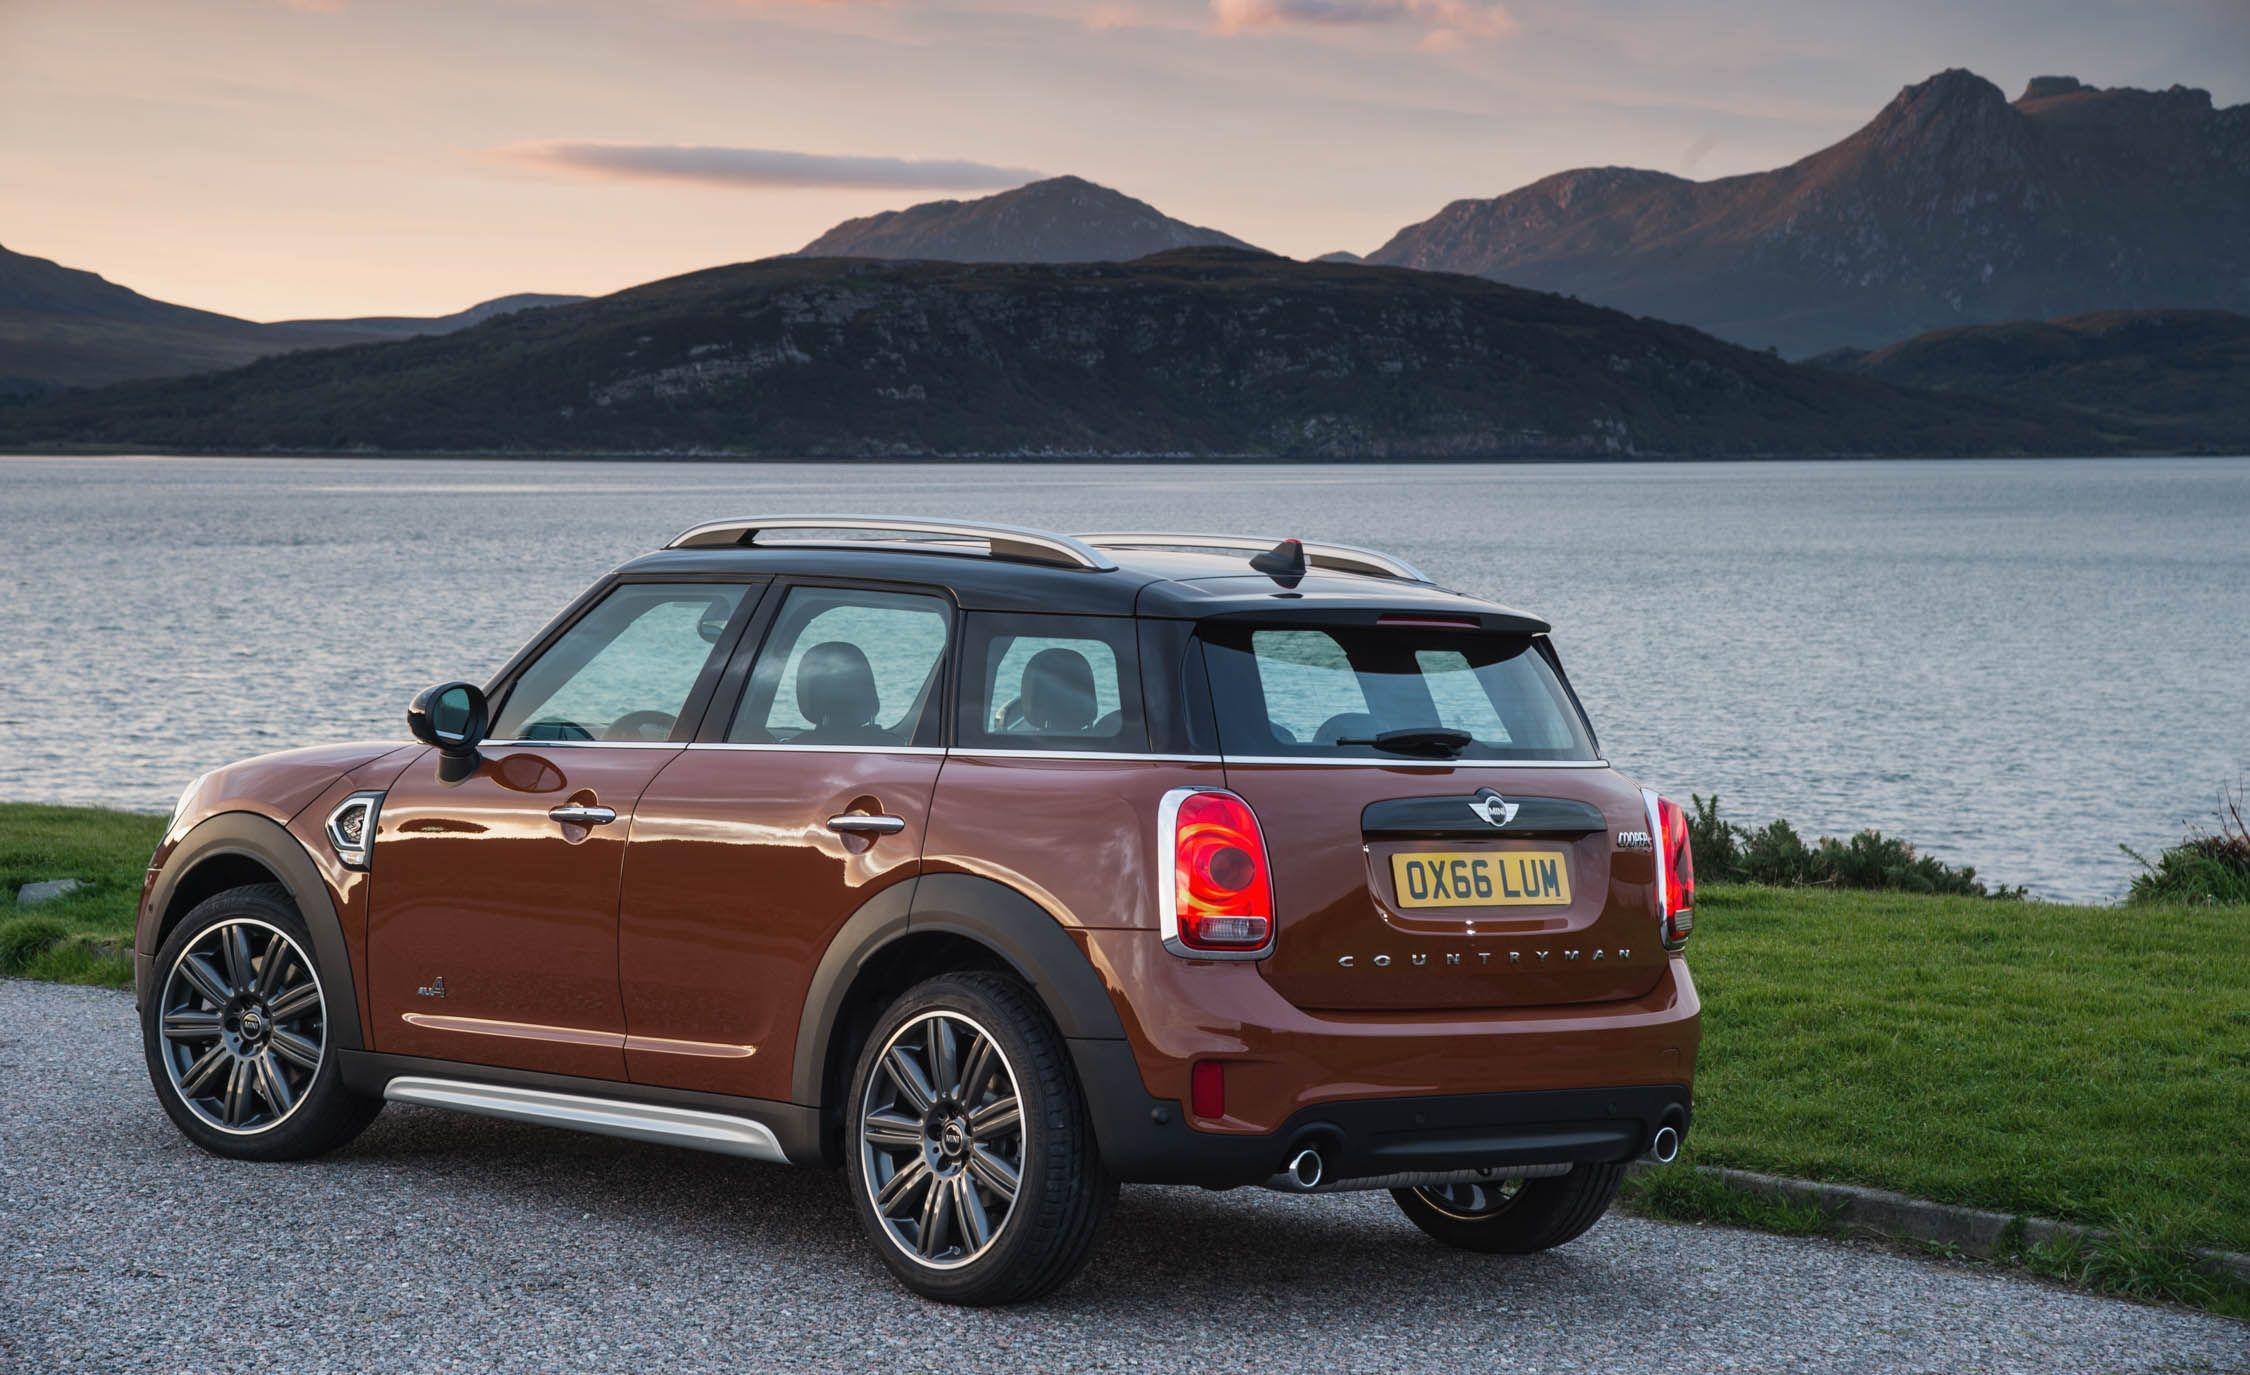 2019 Mini Cooper Countryman S Reviews Price Photos And Specs Car Driver